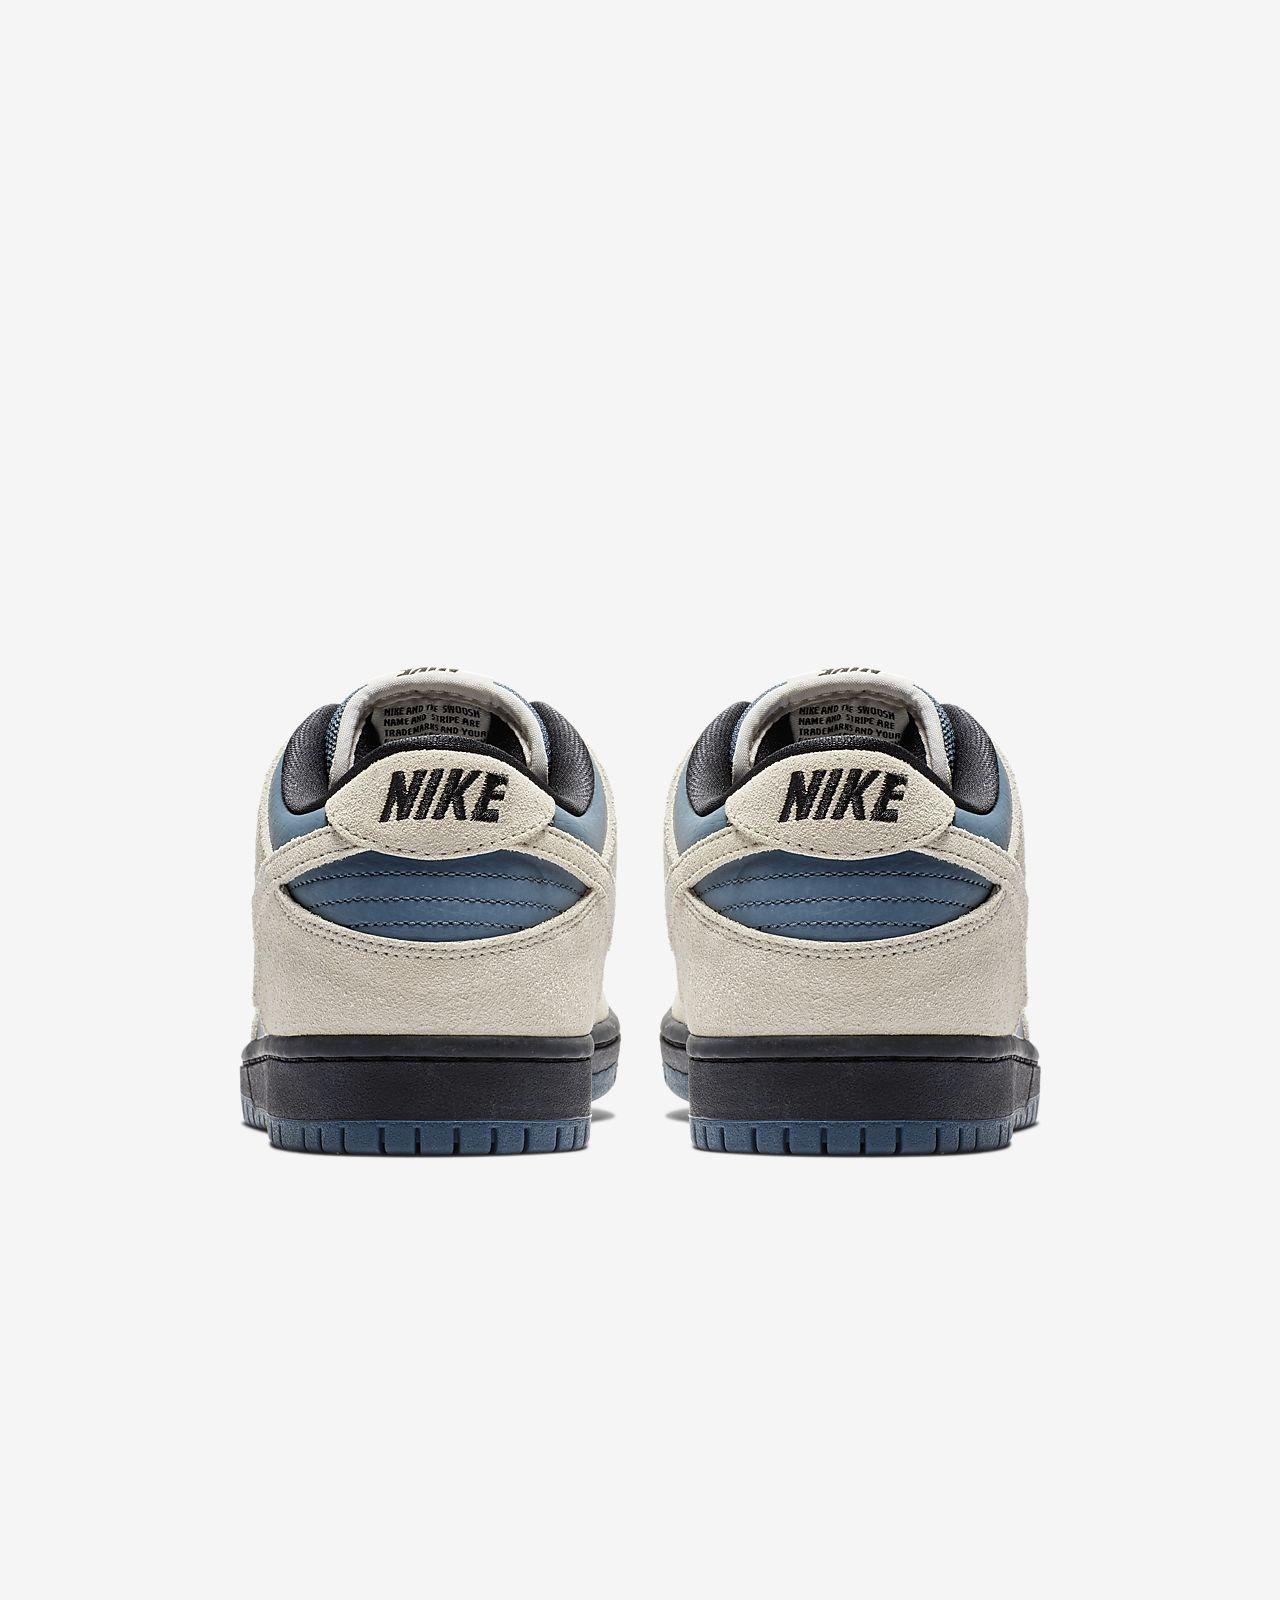 eacc4d16dc921c Nike SB Dunk Low Pro Skate Shoe. Nike.com AU